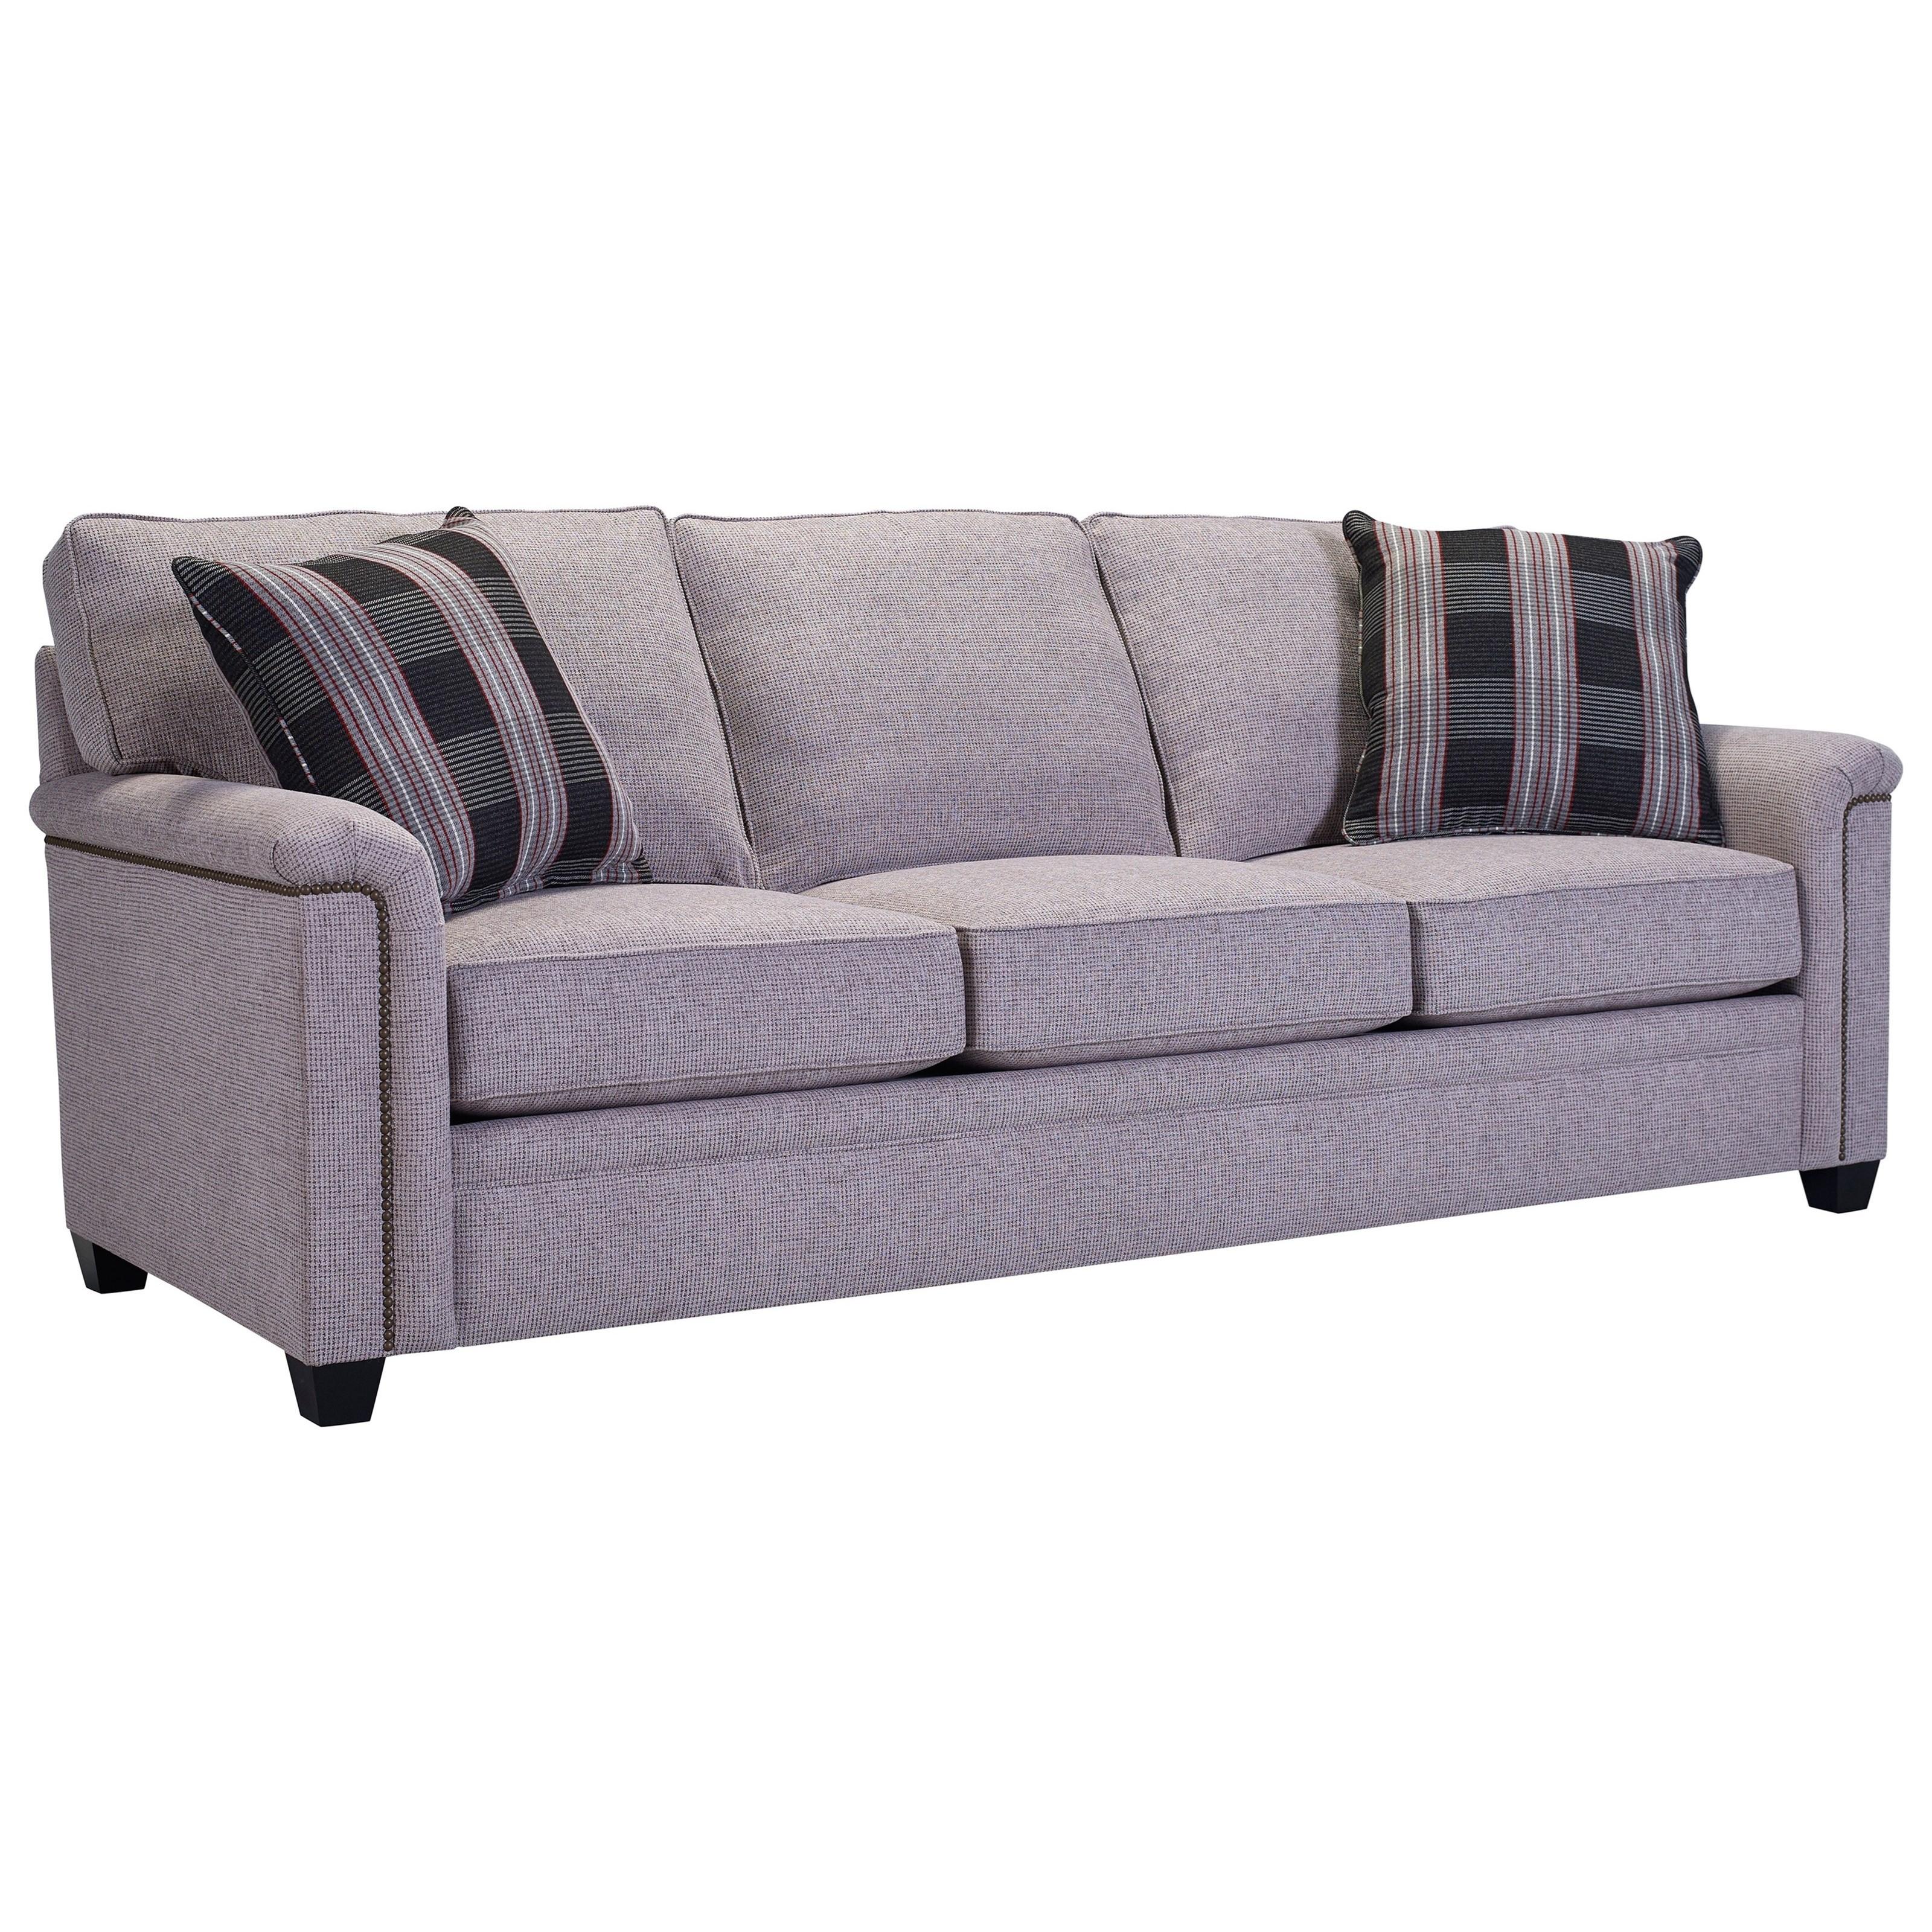 Broyhill Furniture Warren Sofa - Item Number: 4287-3-4695-95